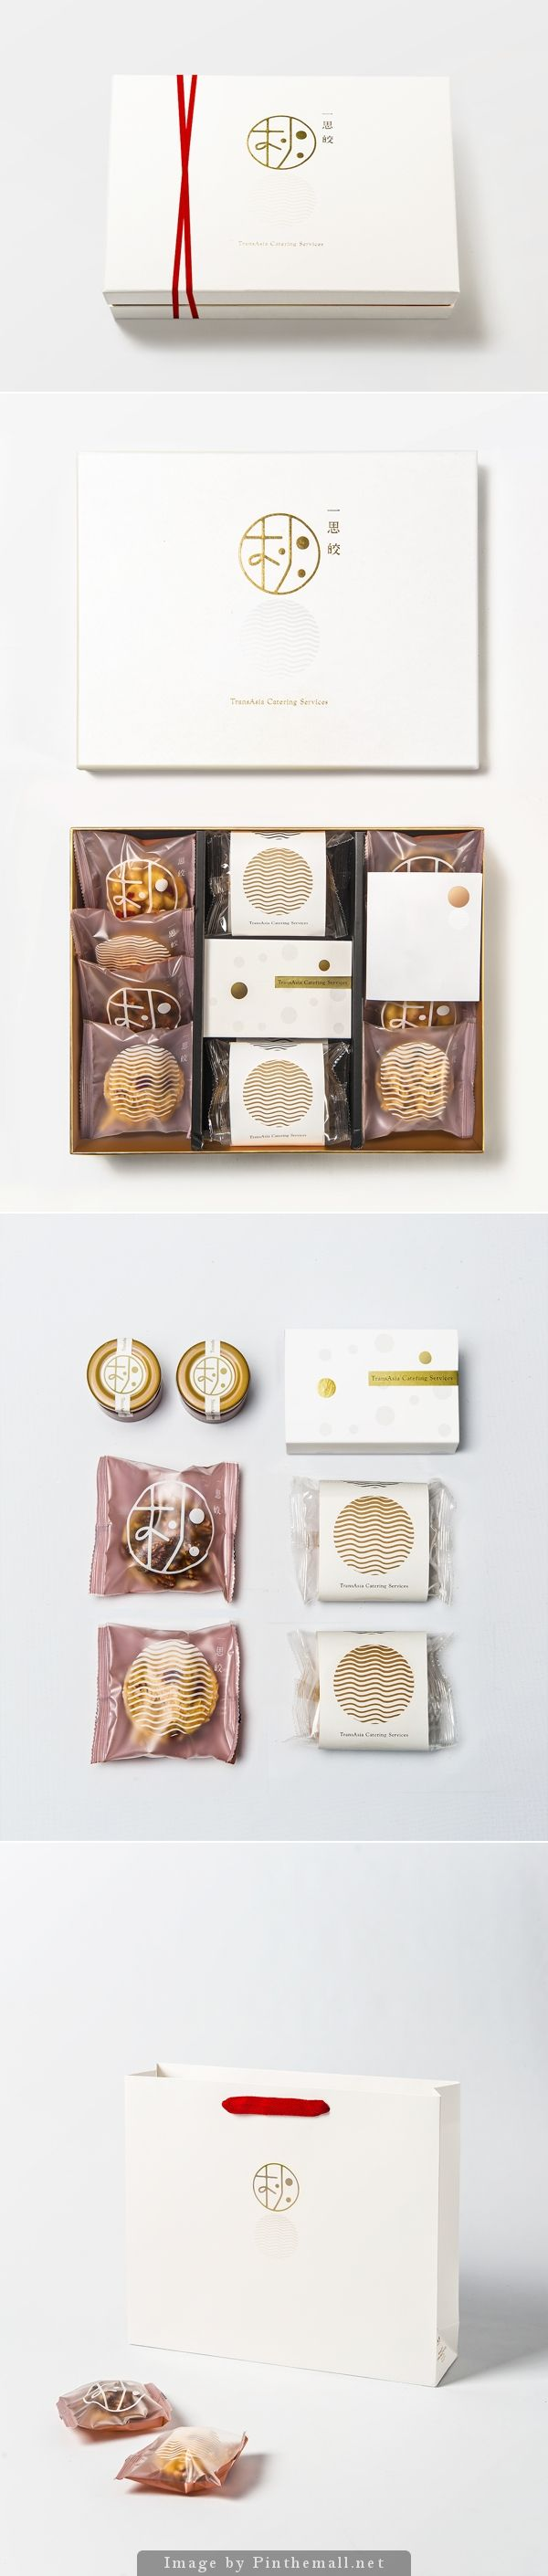 Food gifts - packaging